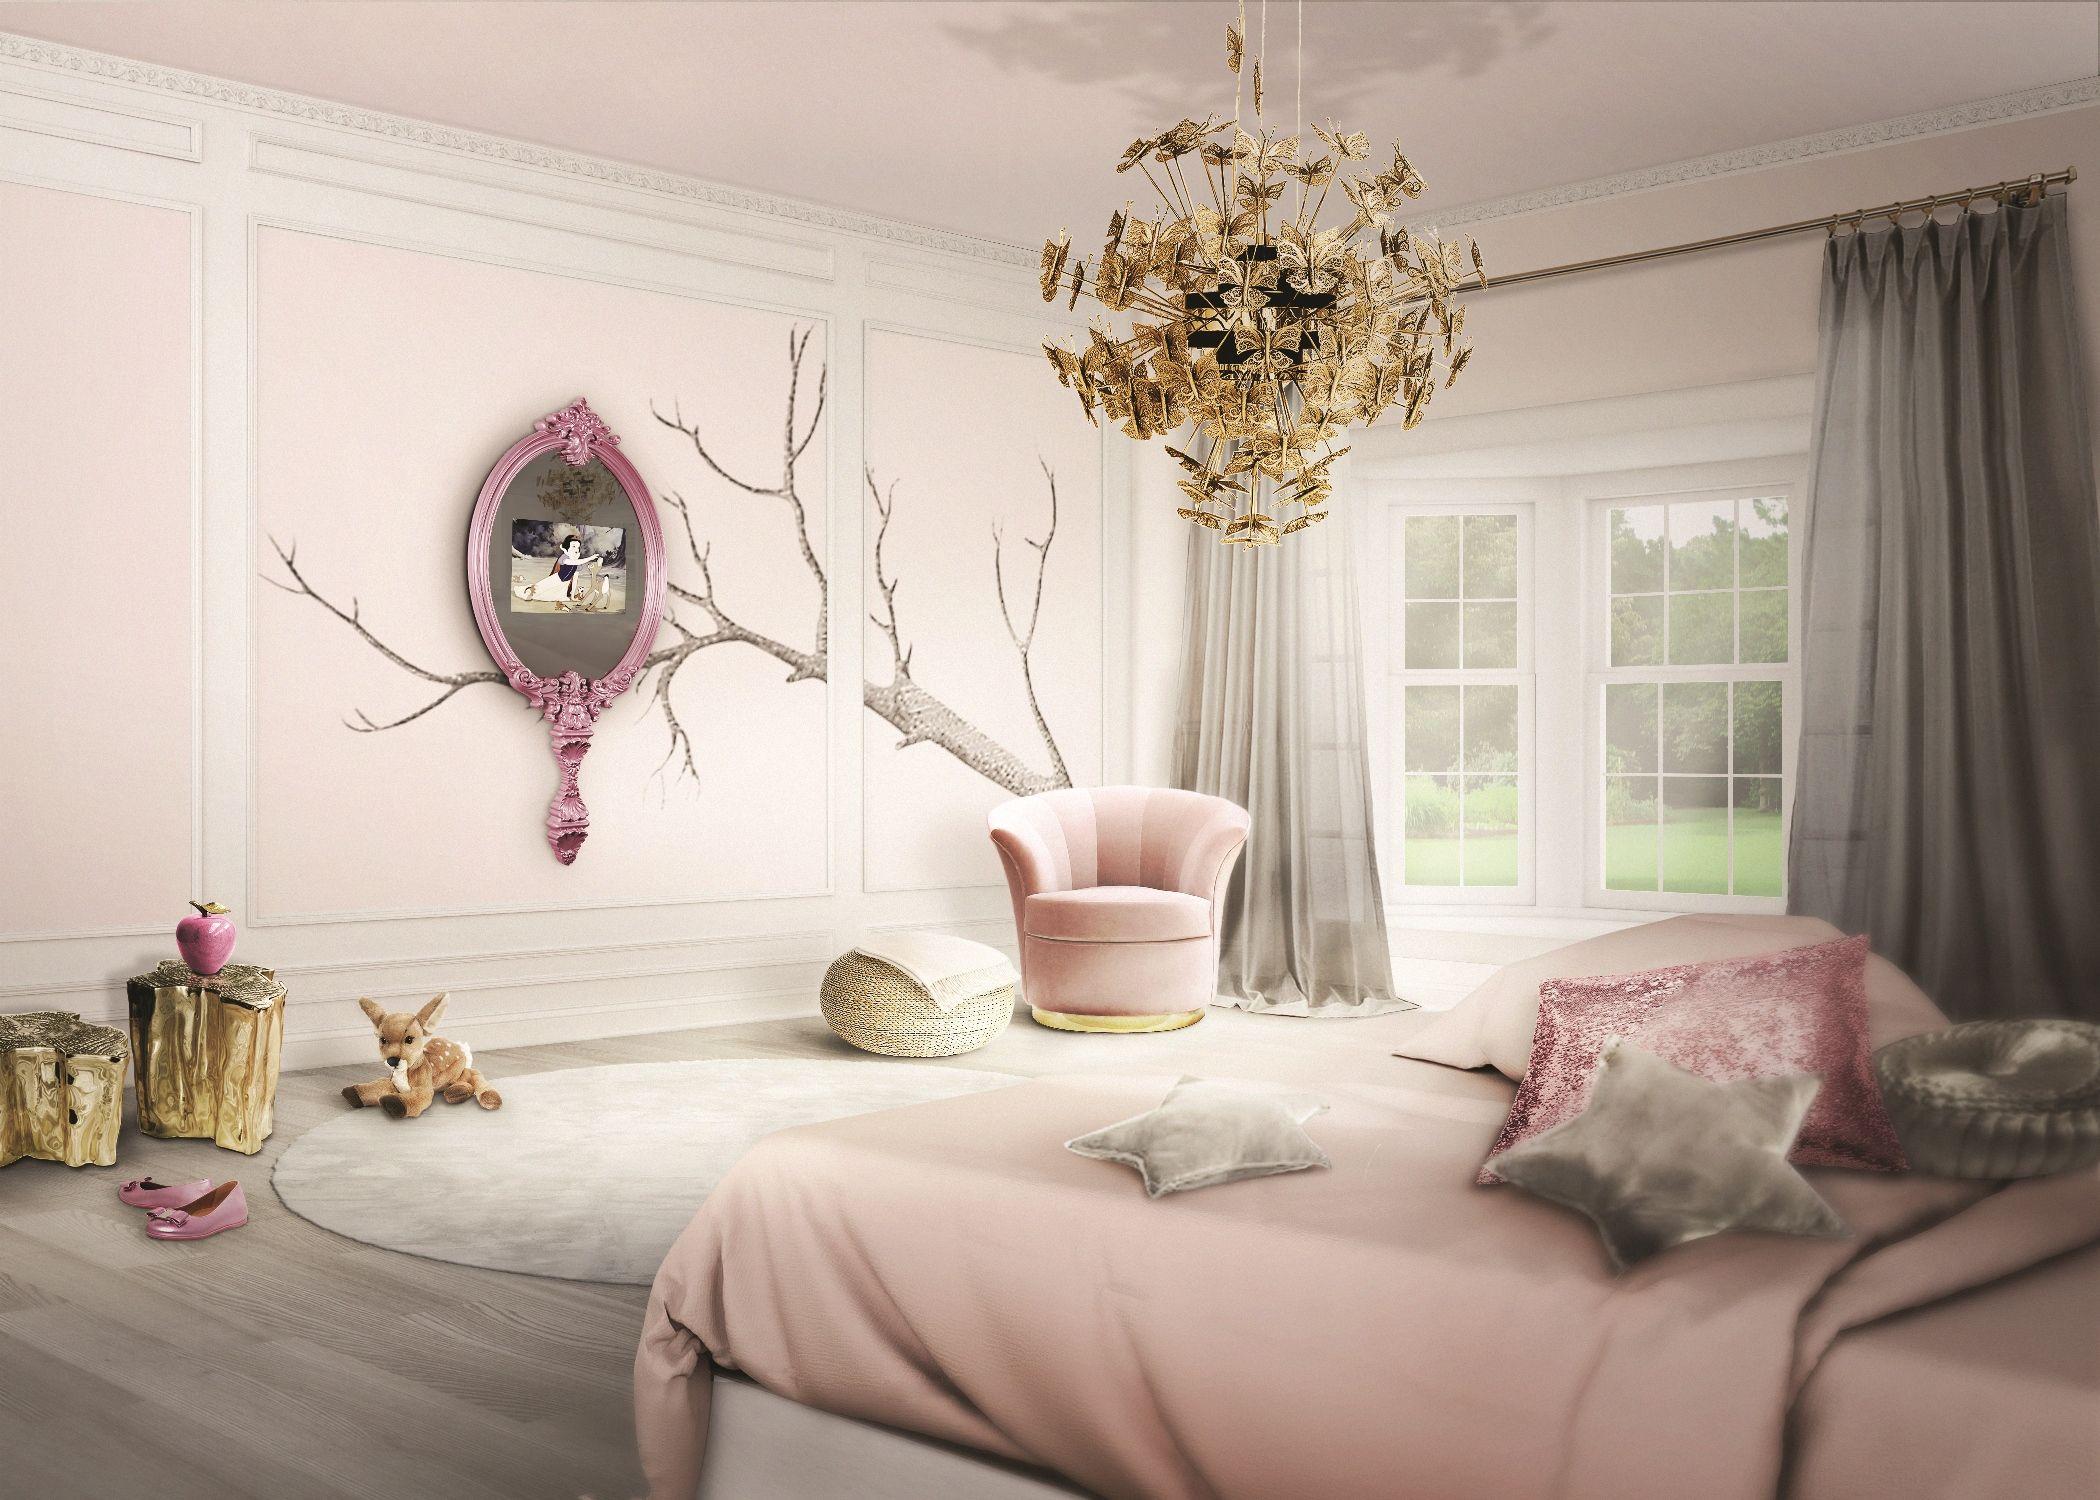 Magical mirror | Germany Design World | Pinterest | Rosa ...